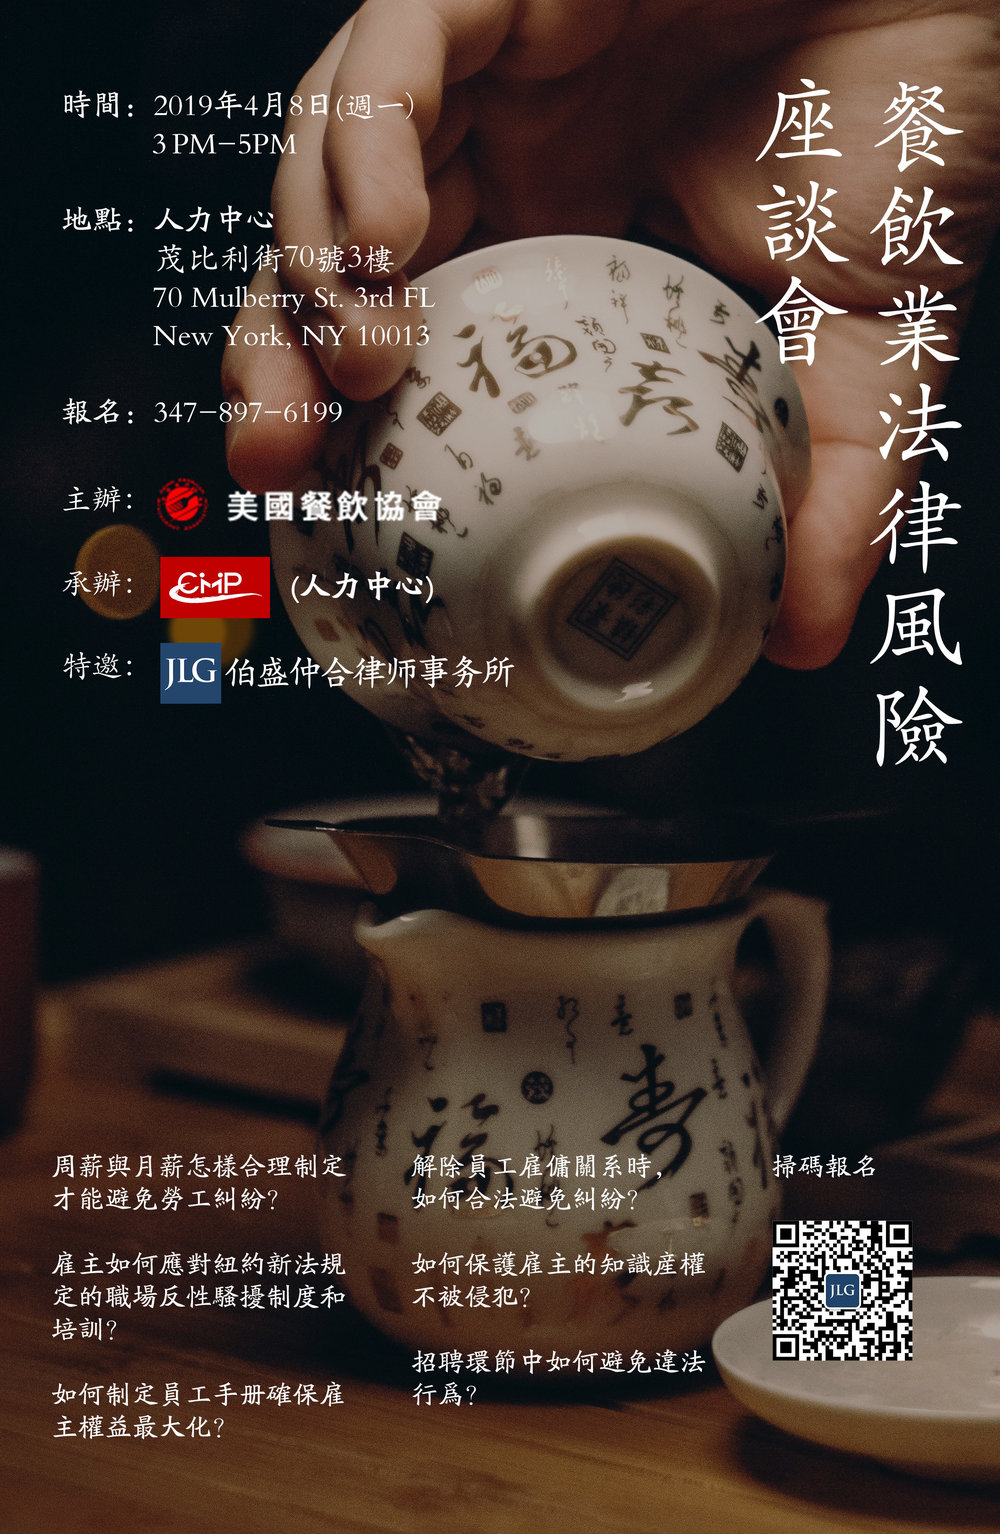 JLG&美国华人餐饮协会&人力中心餐饮讲座 update.jpg